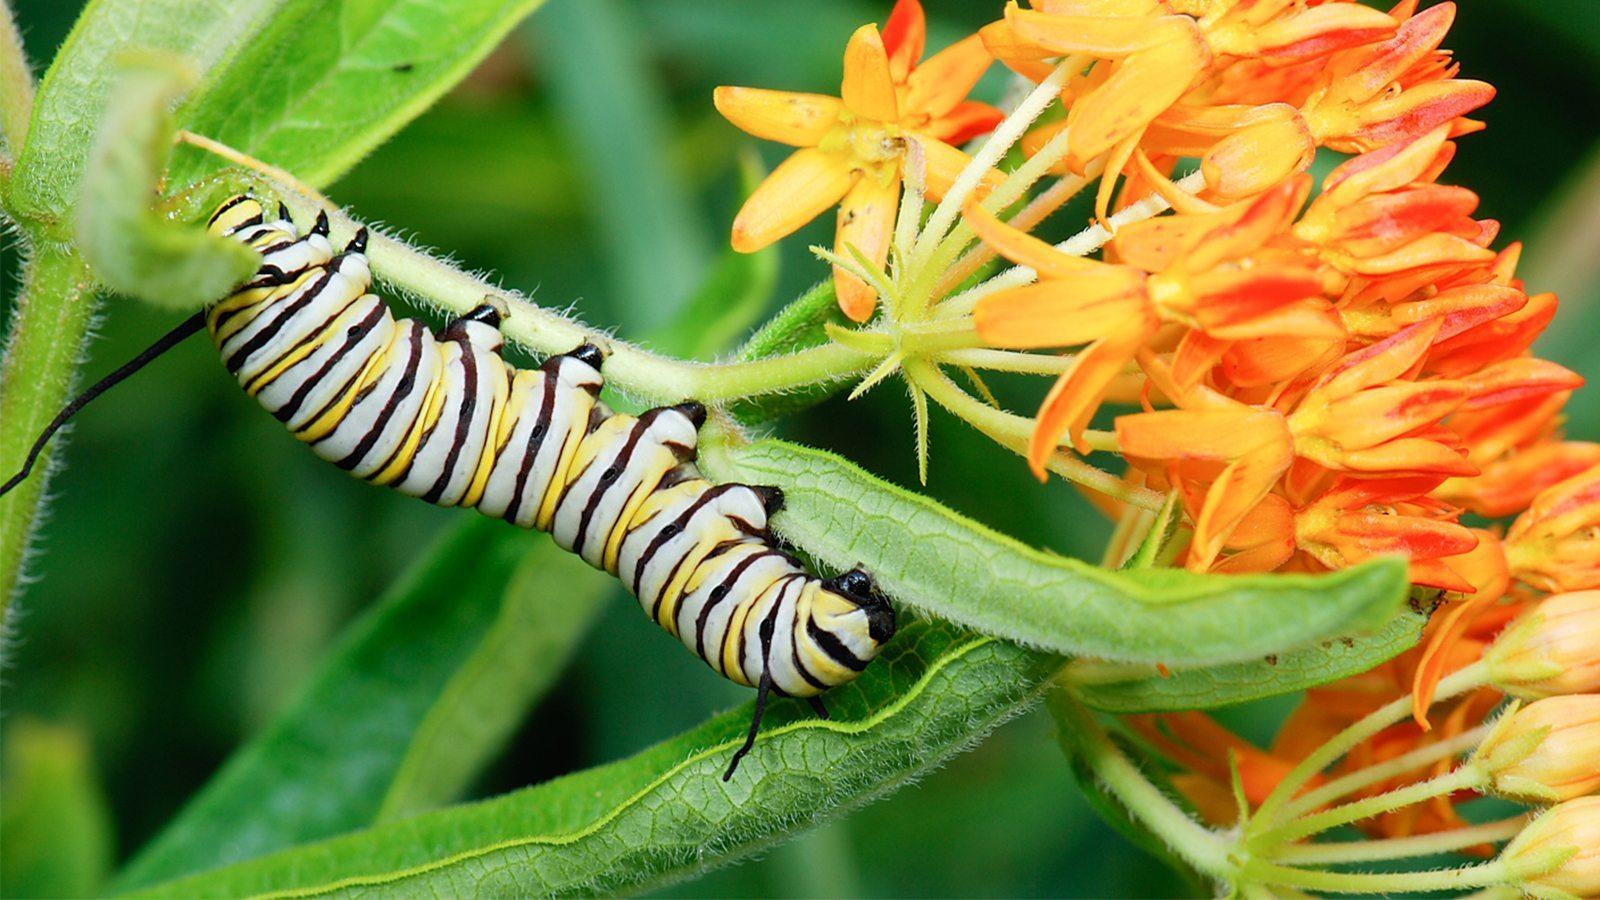 Image: Monarch Caterpillar on an orange flour